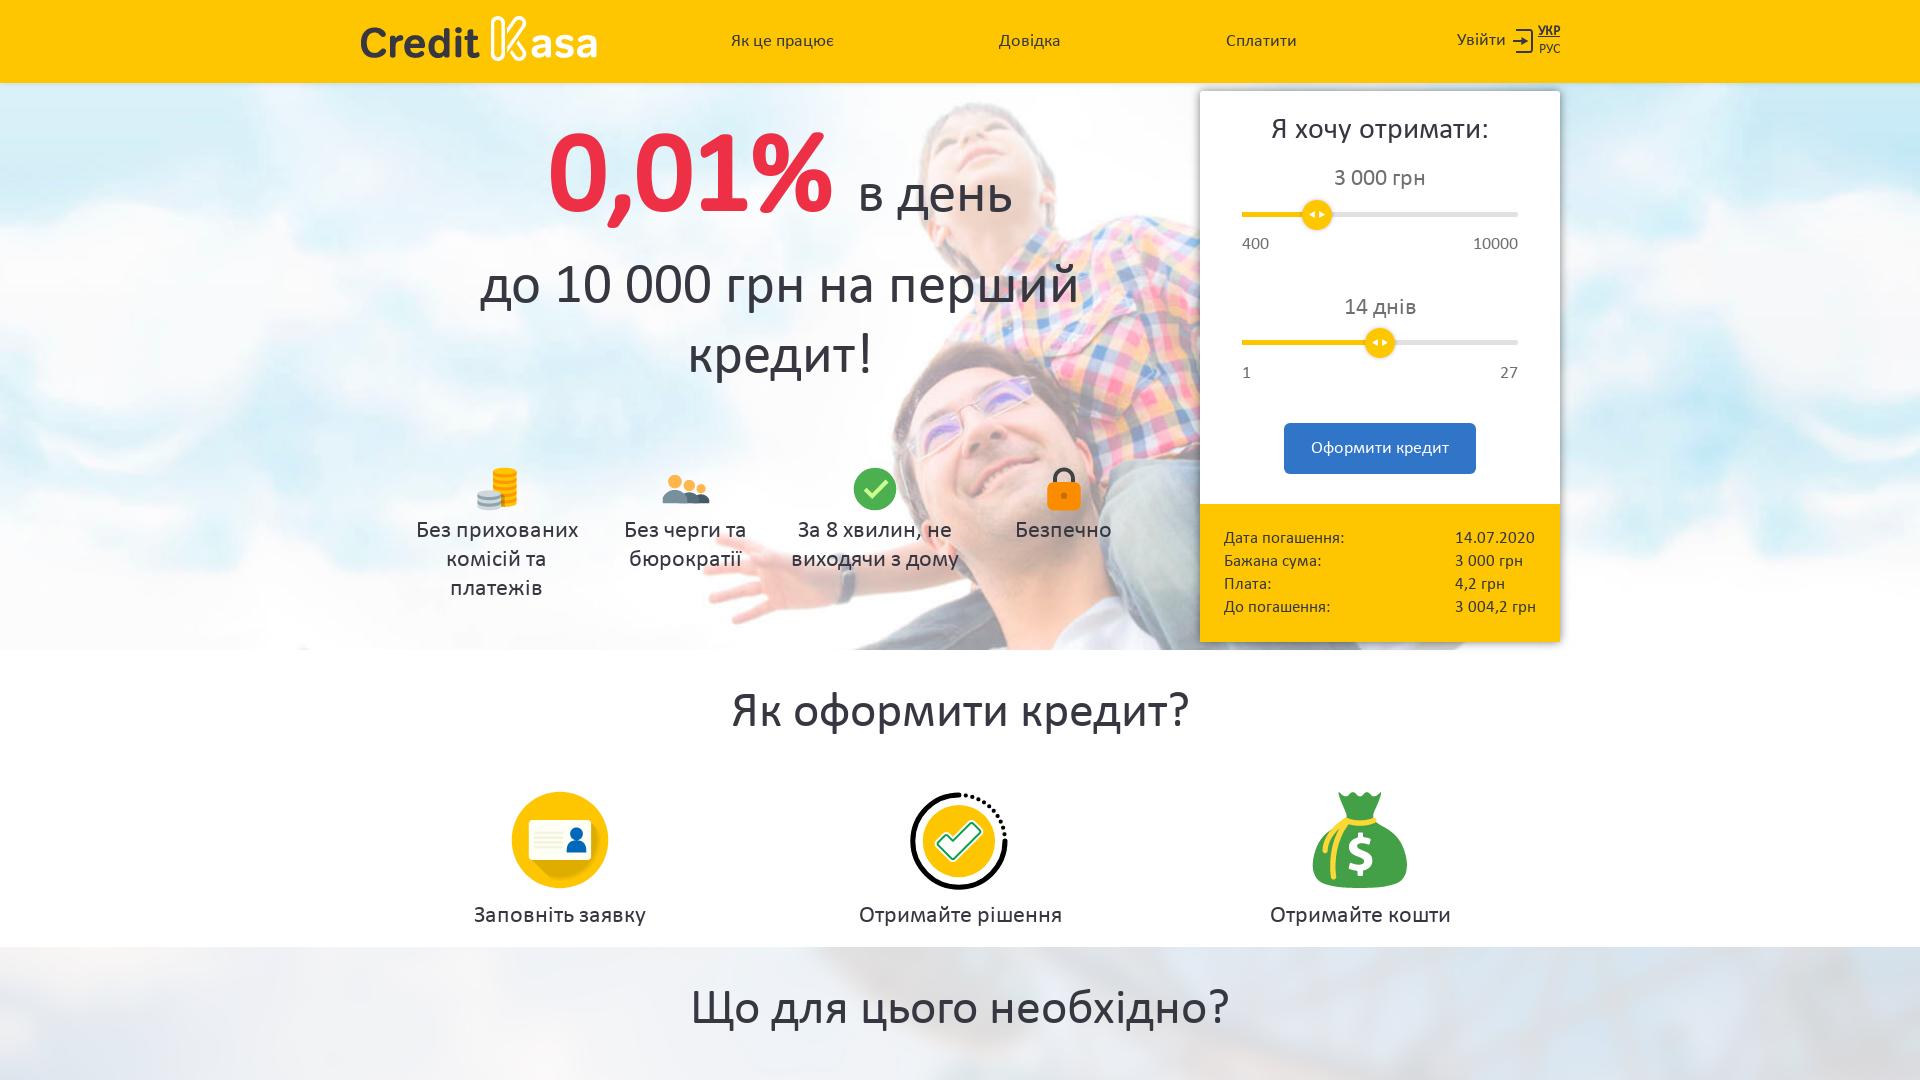 CreditKasa [CPL, CPS] UA website